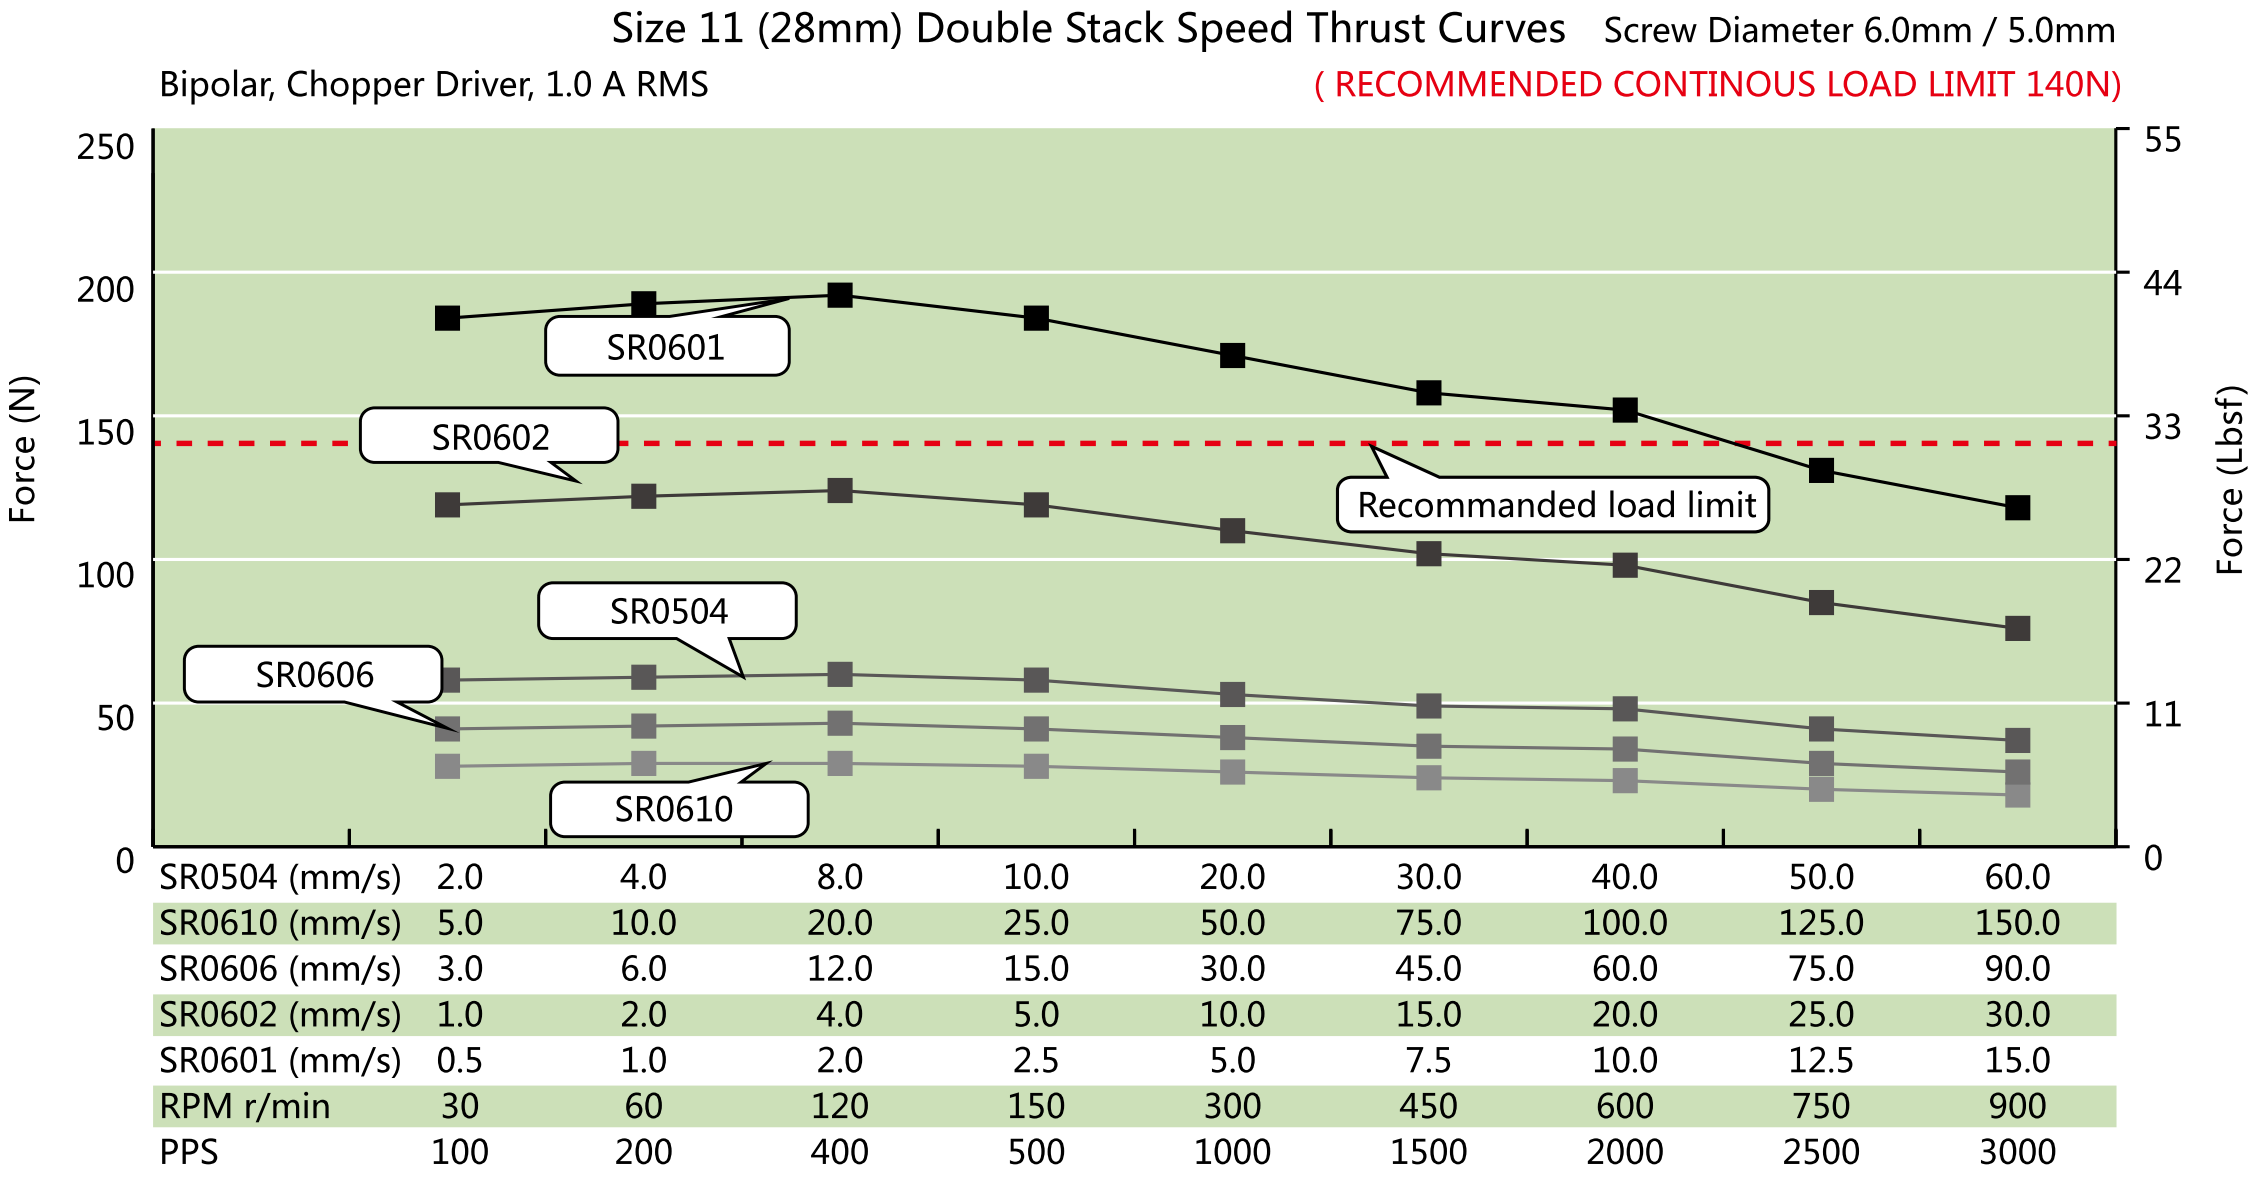 NEMA 11 Double Stack Ball Screw Actuator Speed Thrust Curve